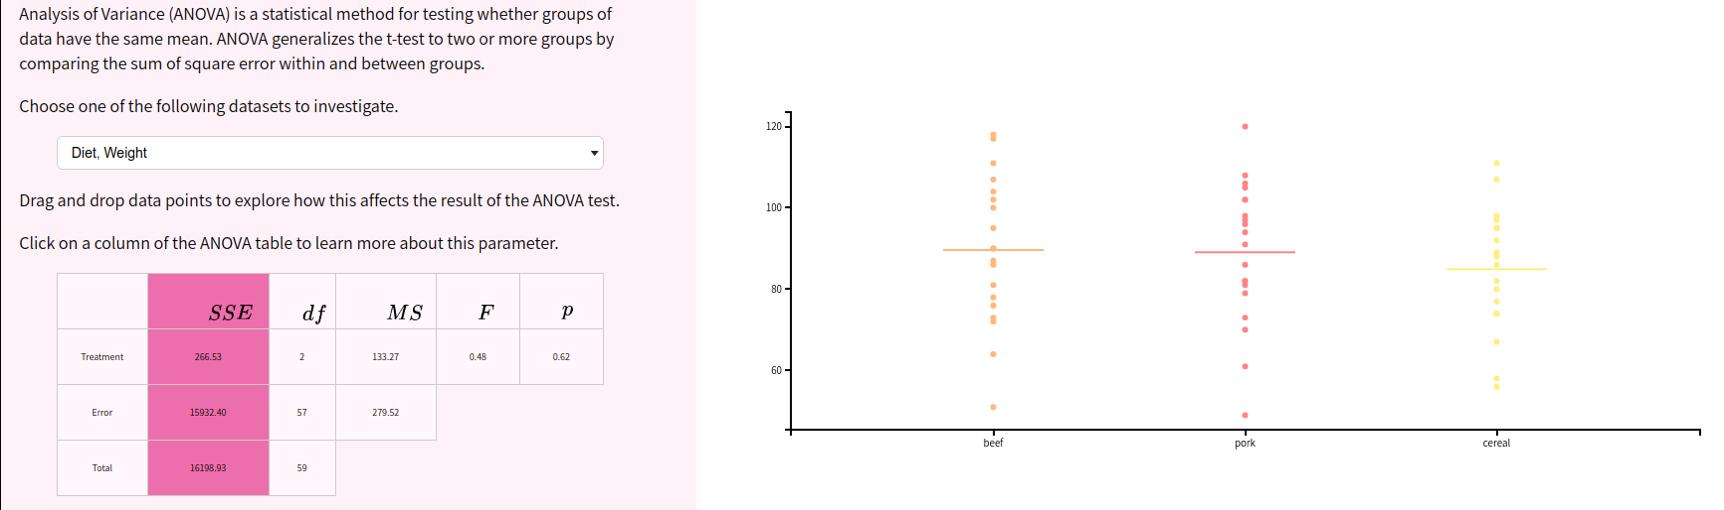 analysis_of_variance